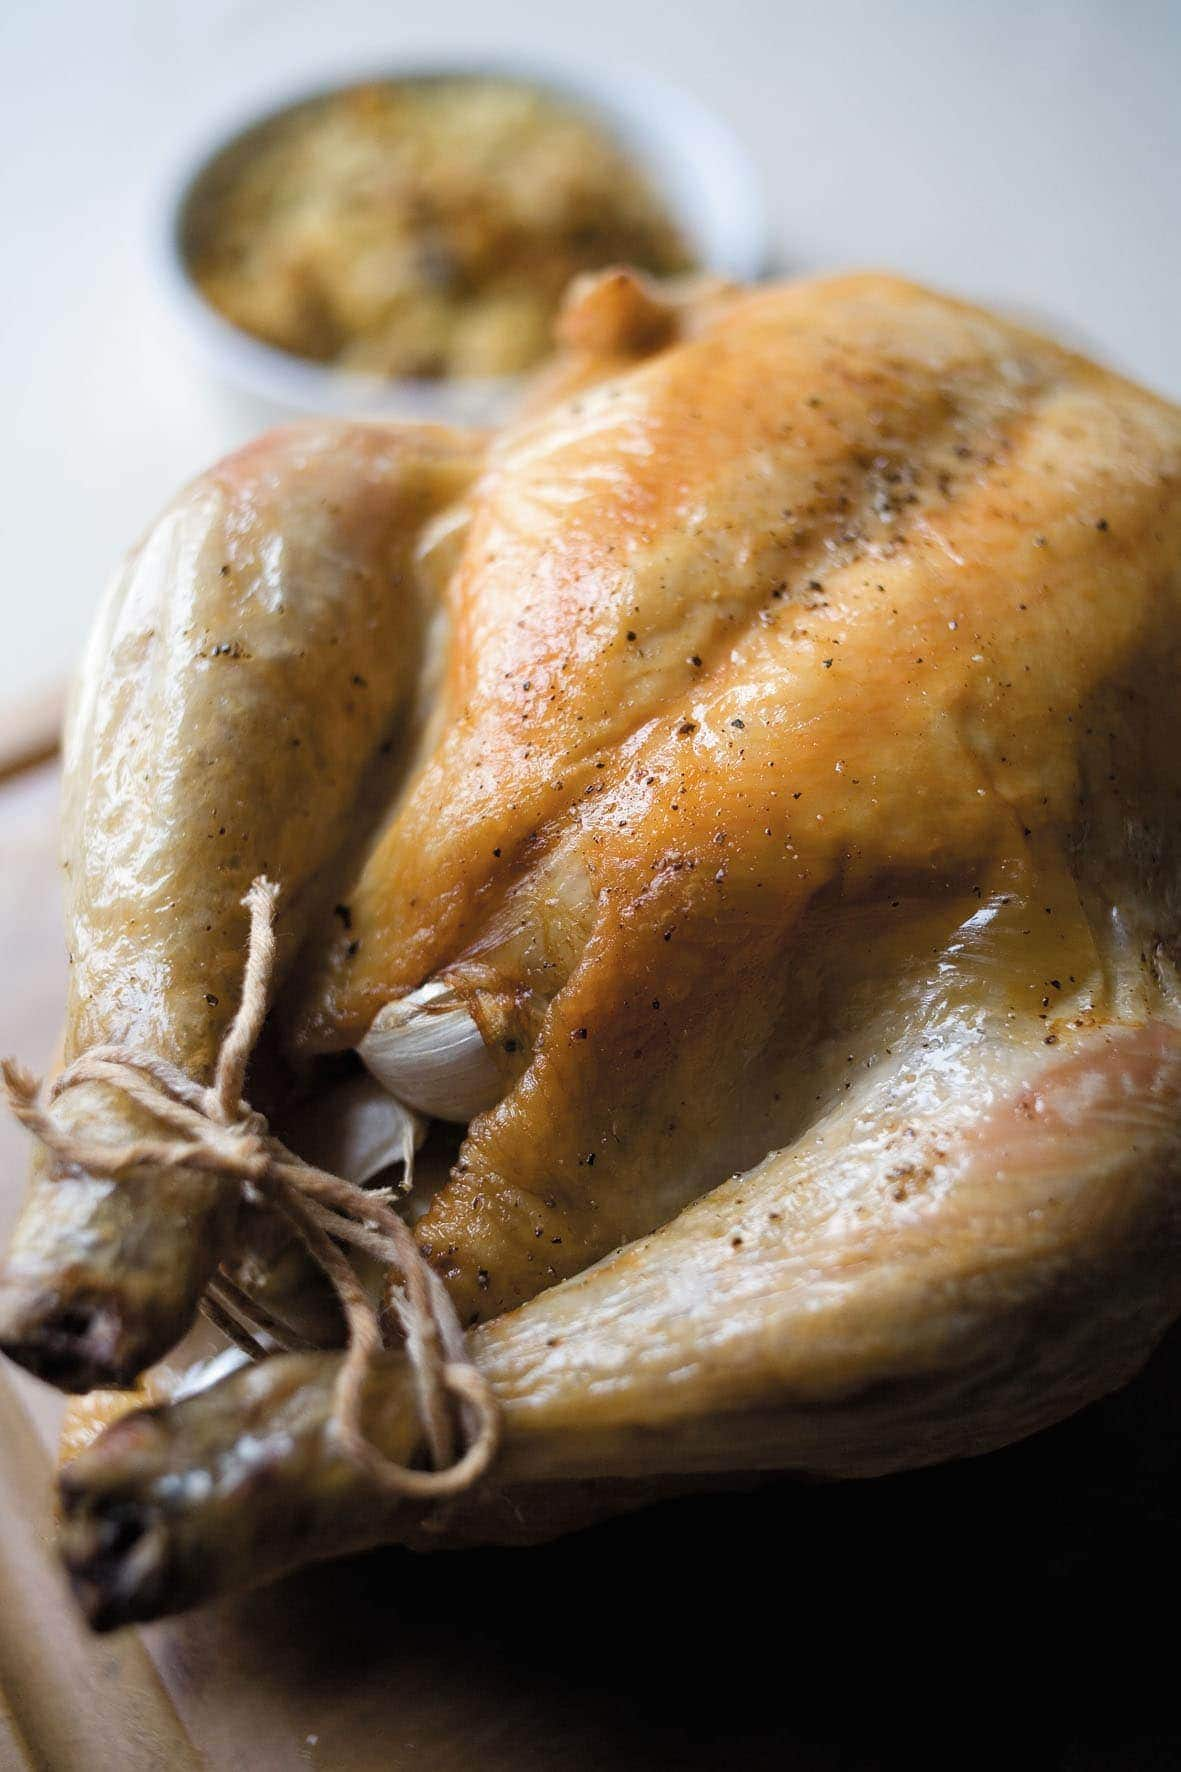 Lemon and garlic roasted chicken